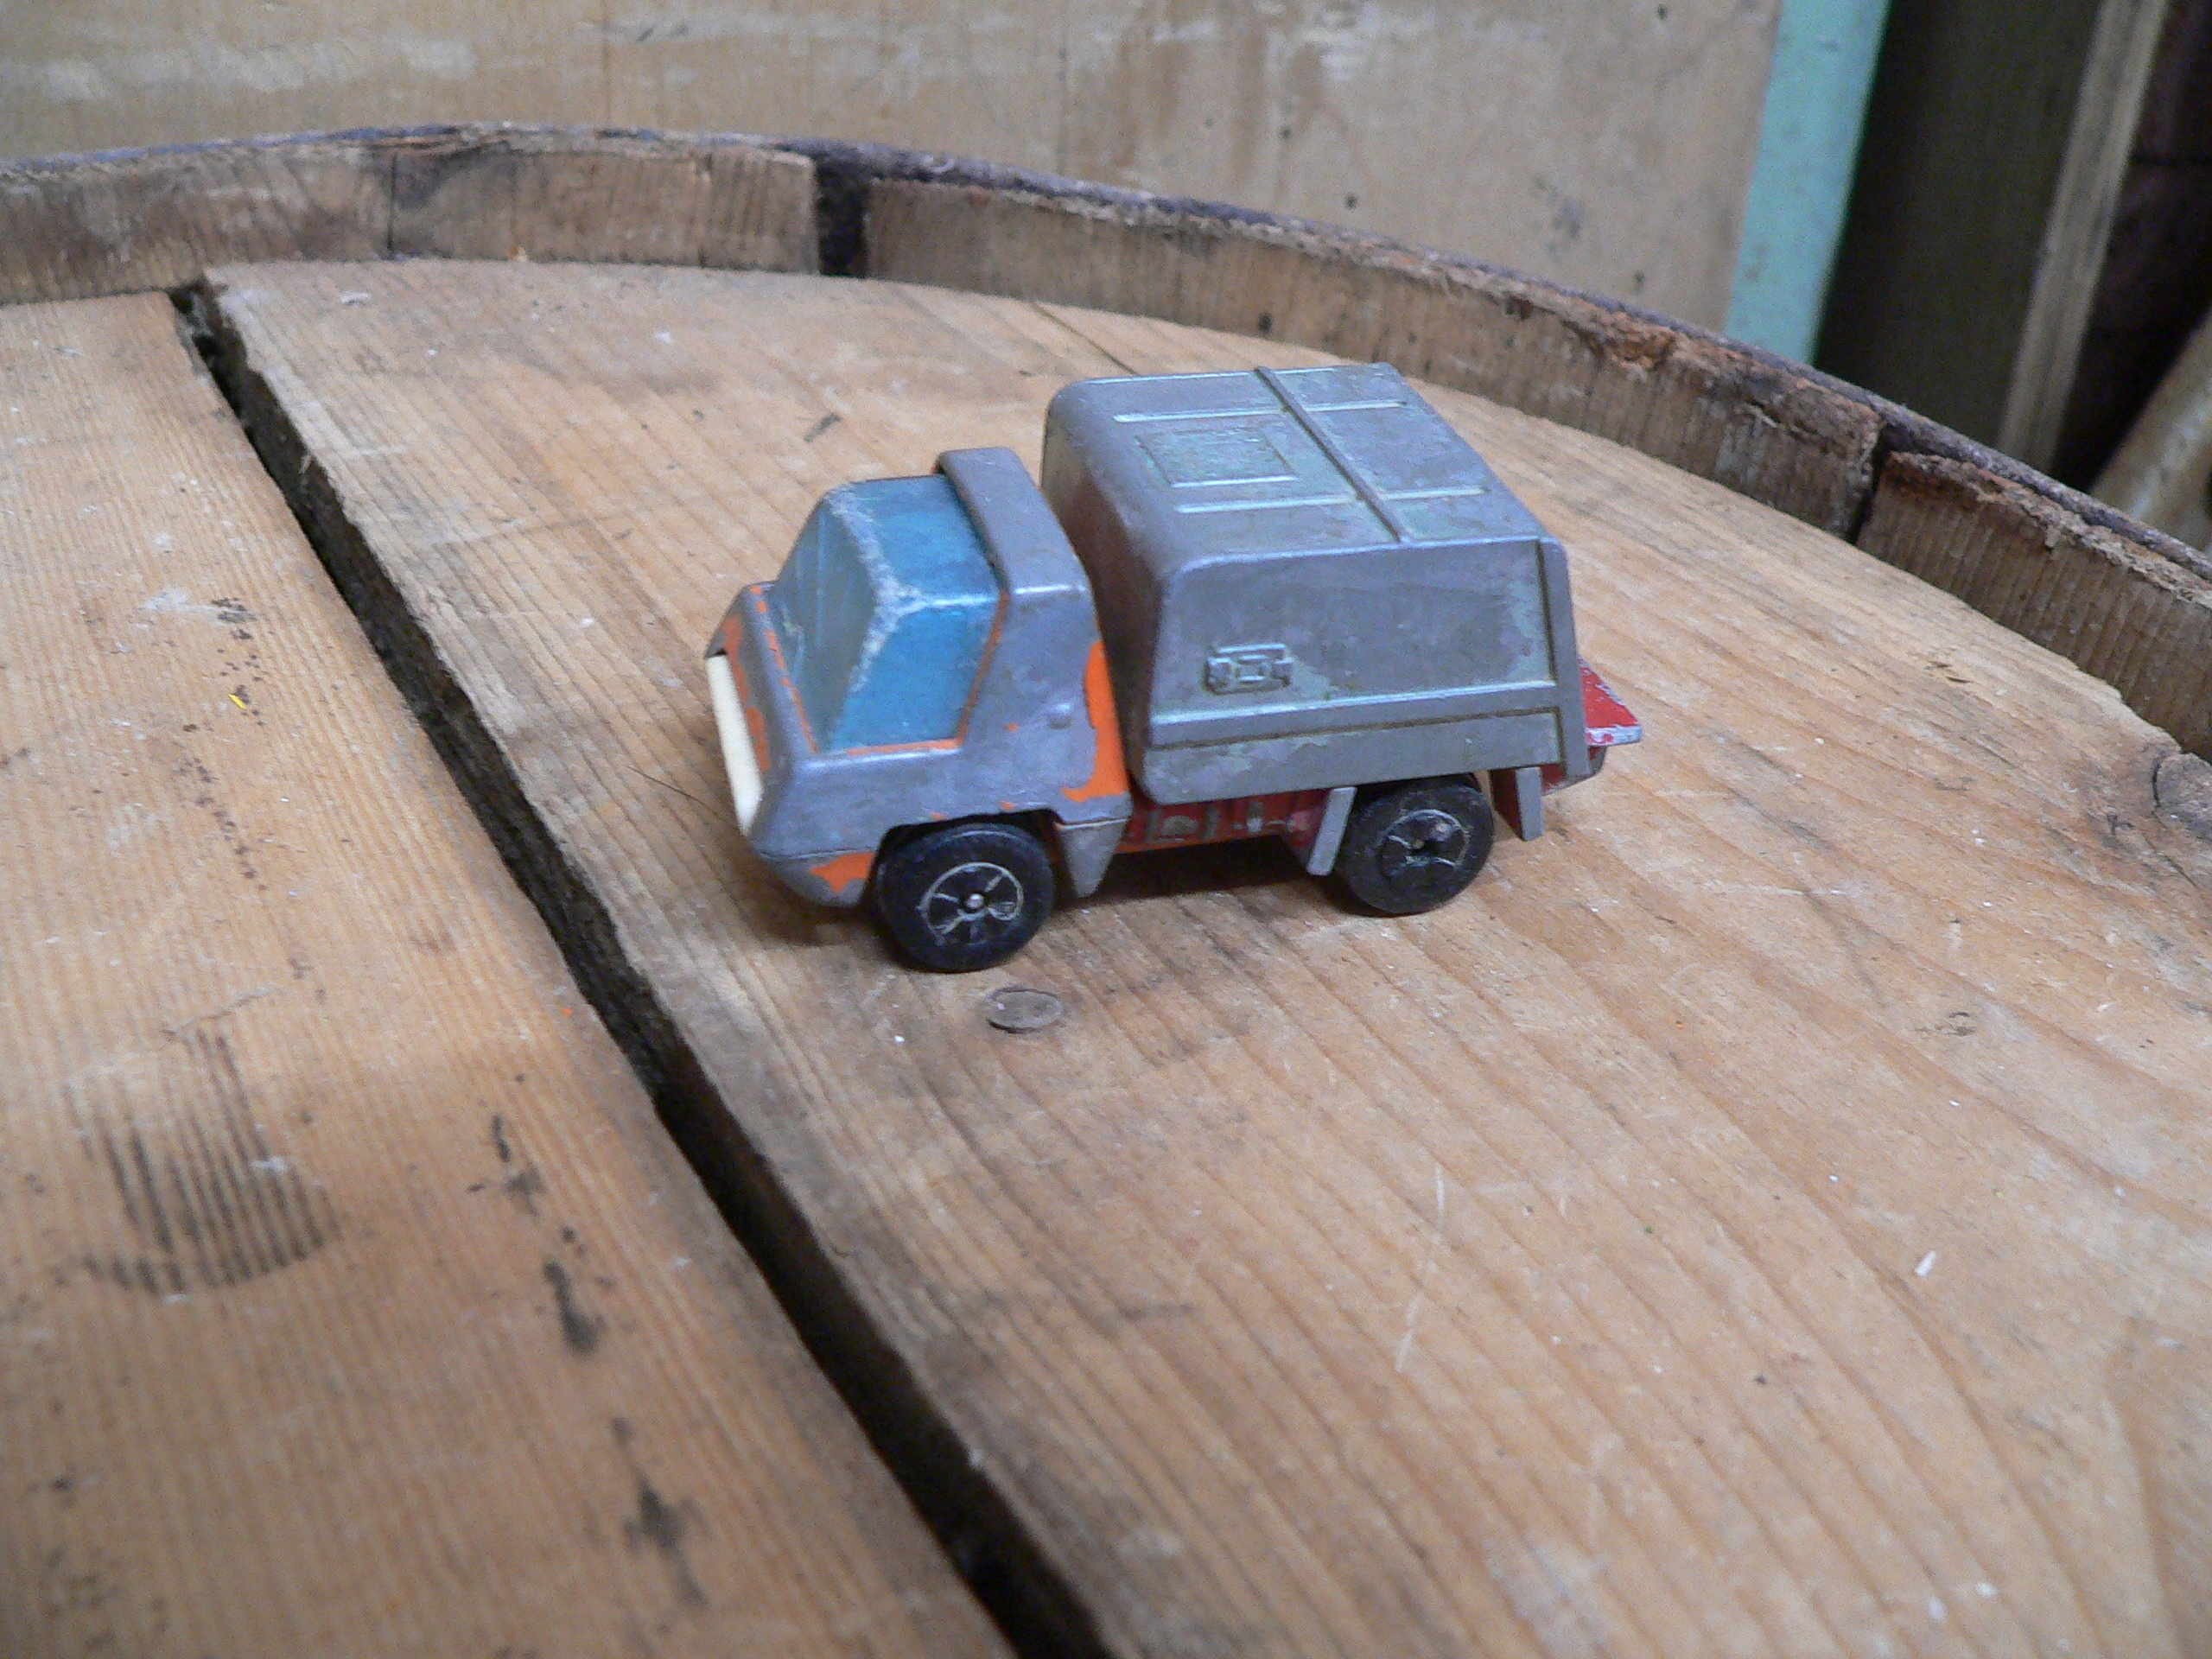 Camion playart vintage # 6793.29